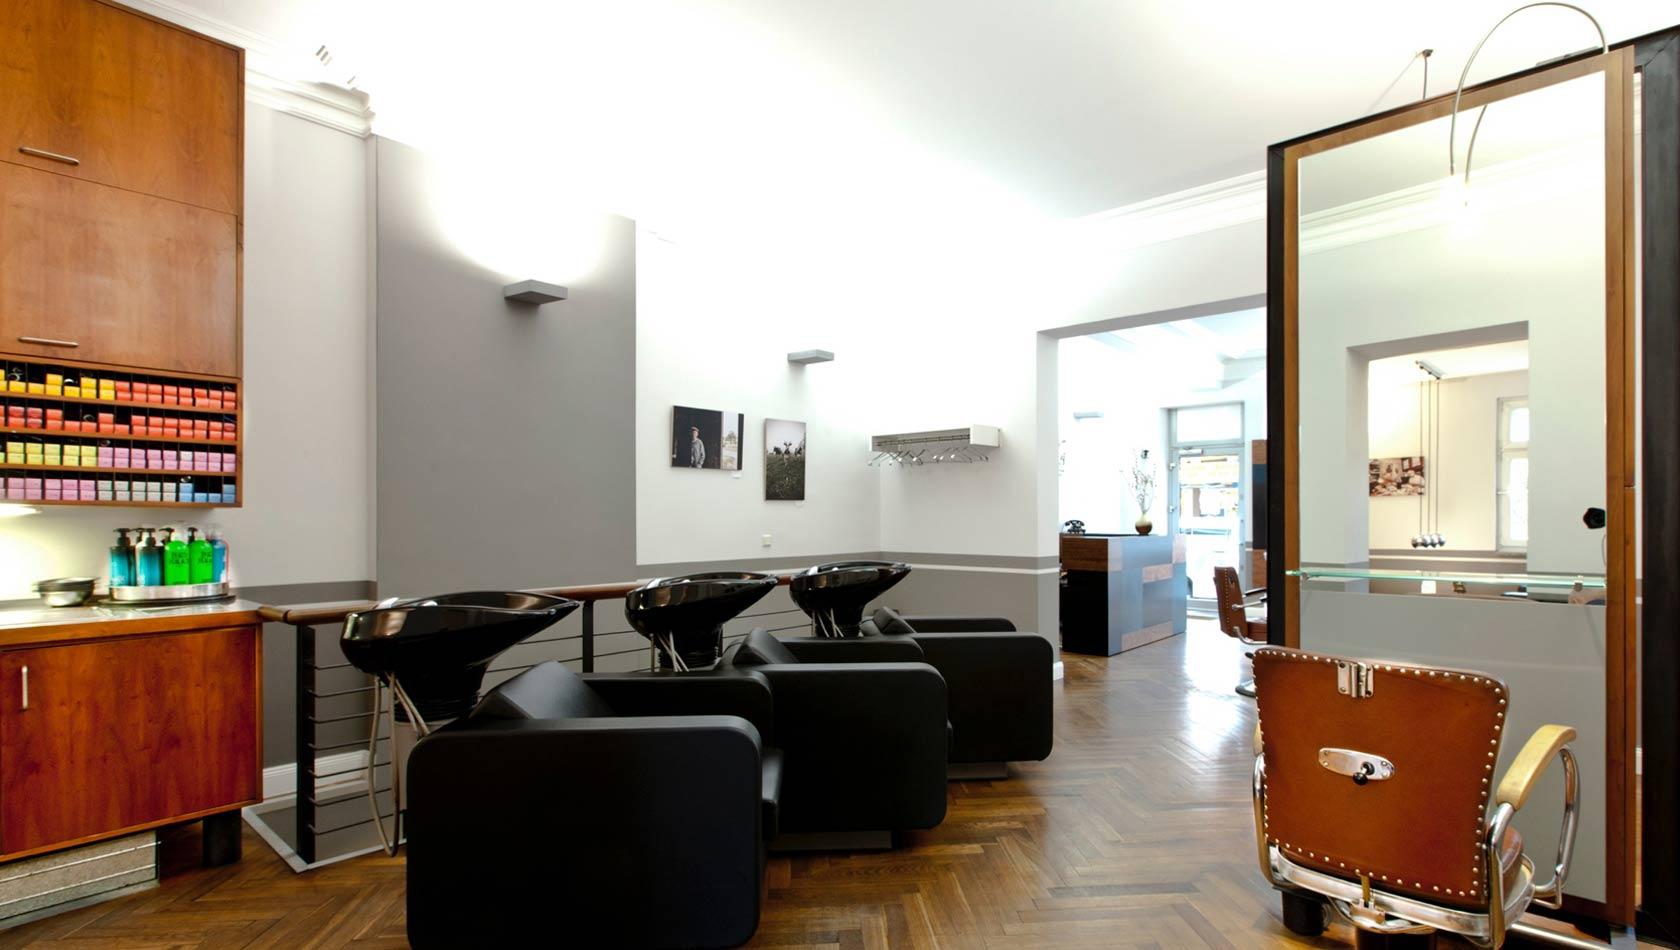 preise friseur hamburg saint paul 39 s. Black Bedroom Furniture Sets. Home Design Ideas